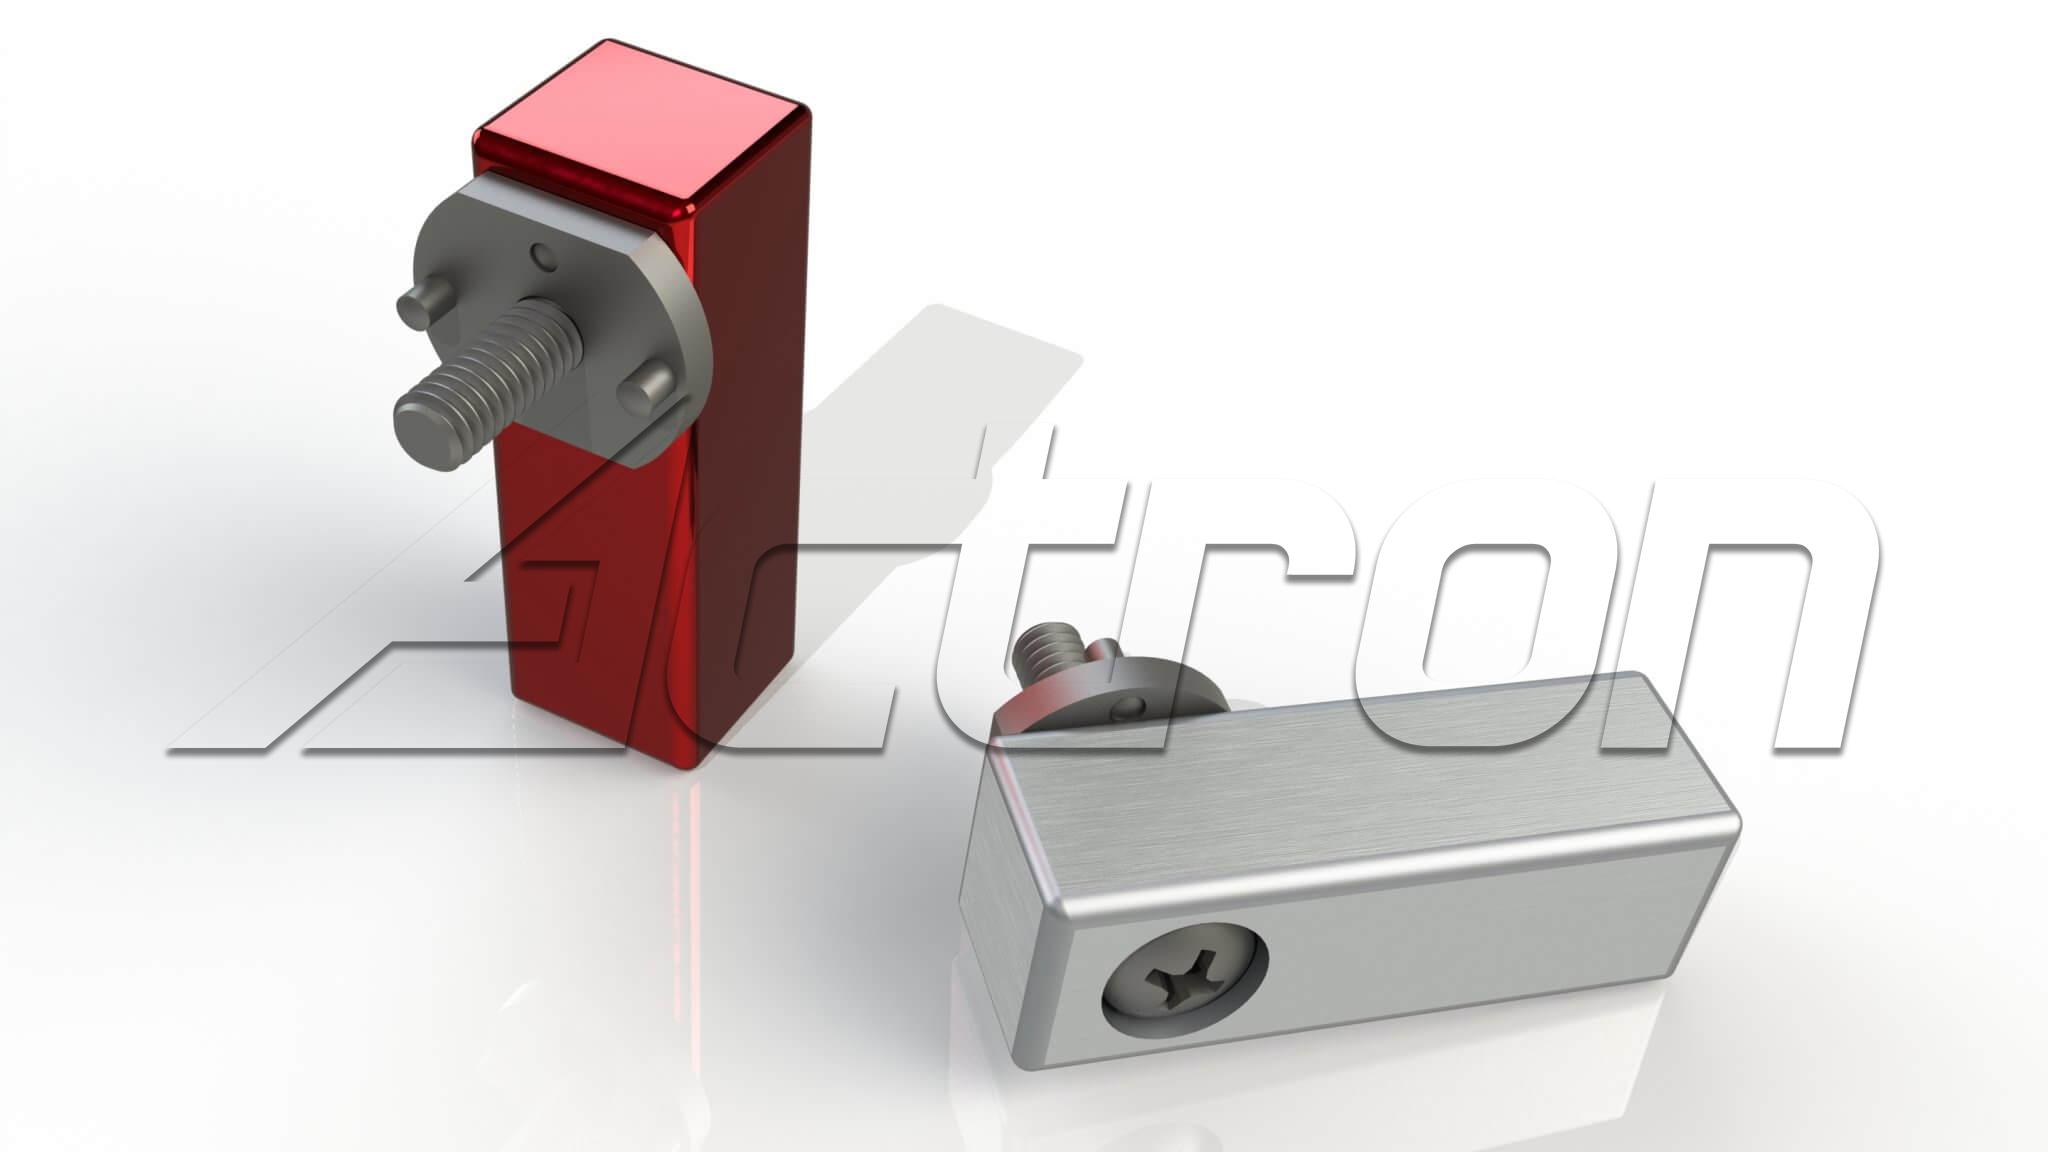 1-4-turn-retainer-4799-a35579.jpg